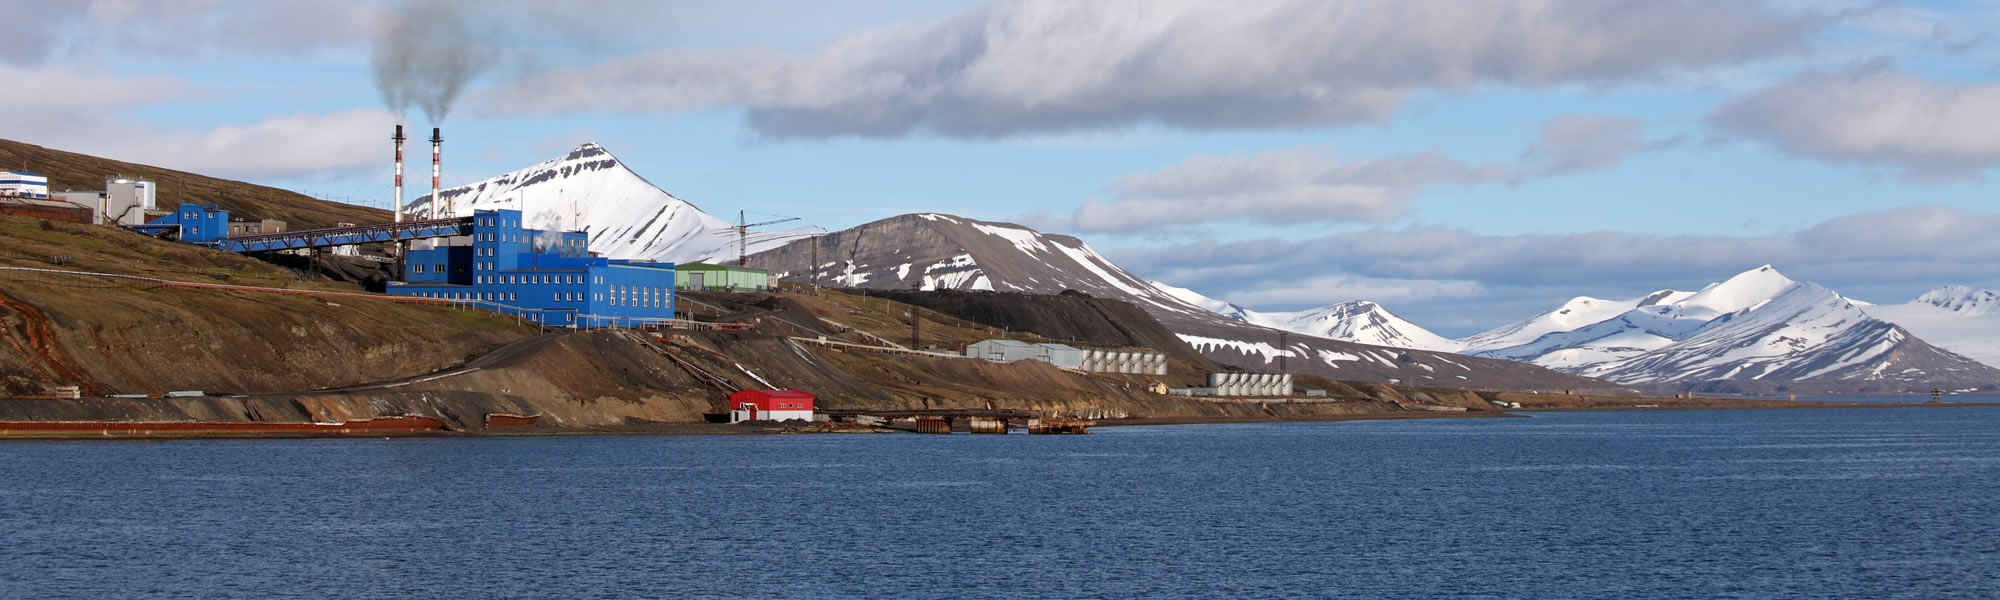 banner-7-mining